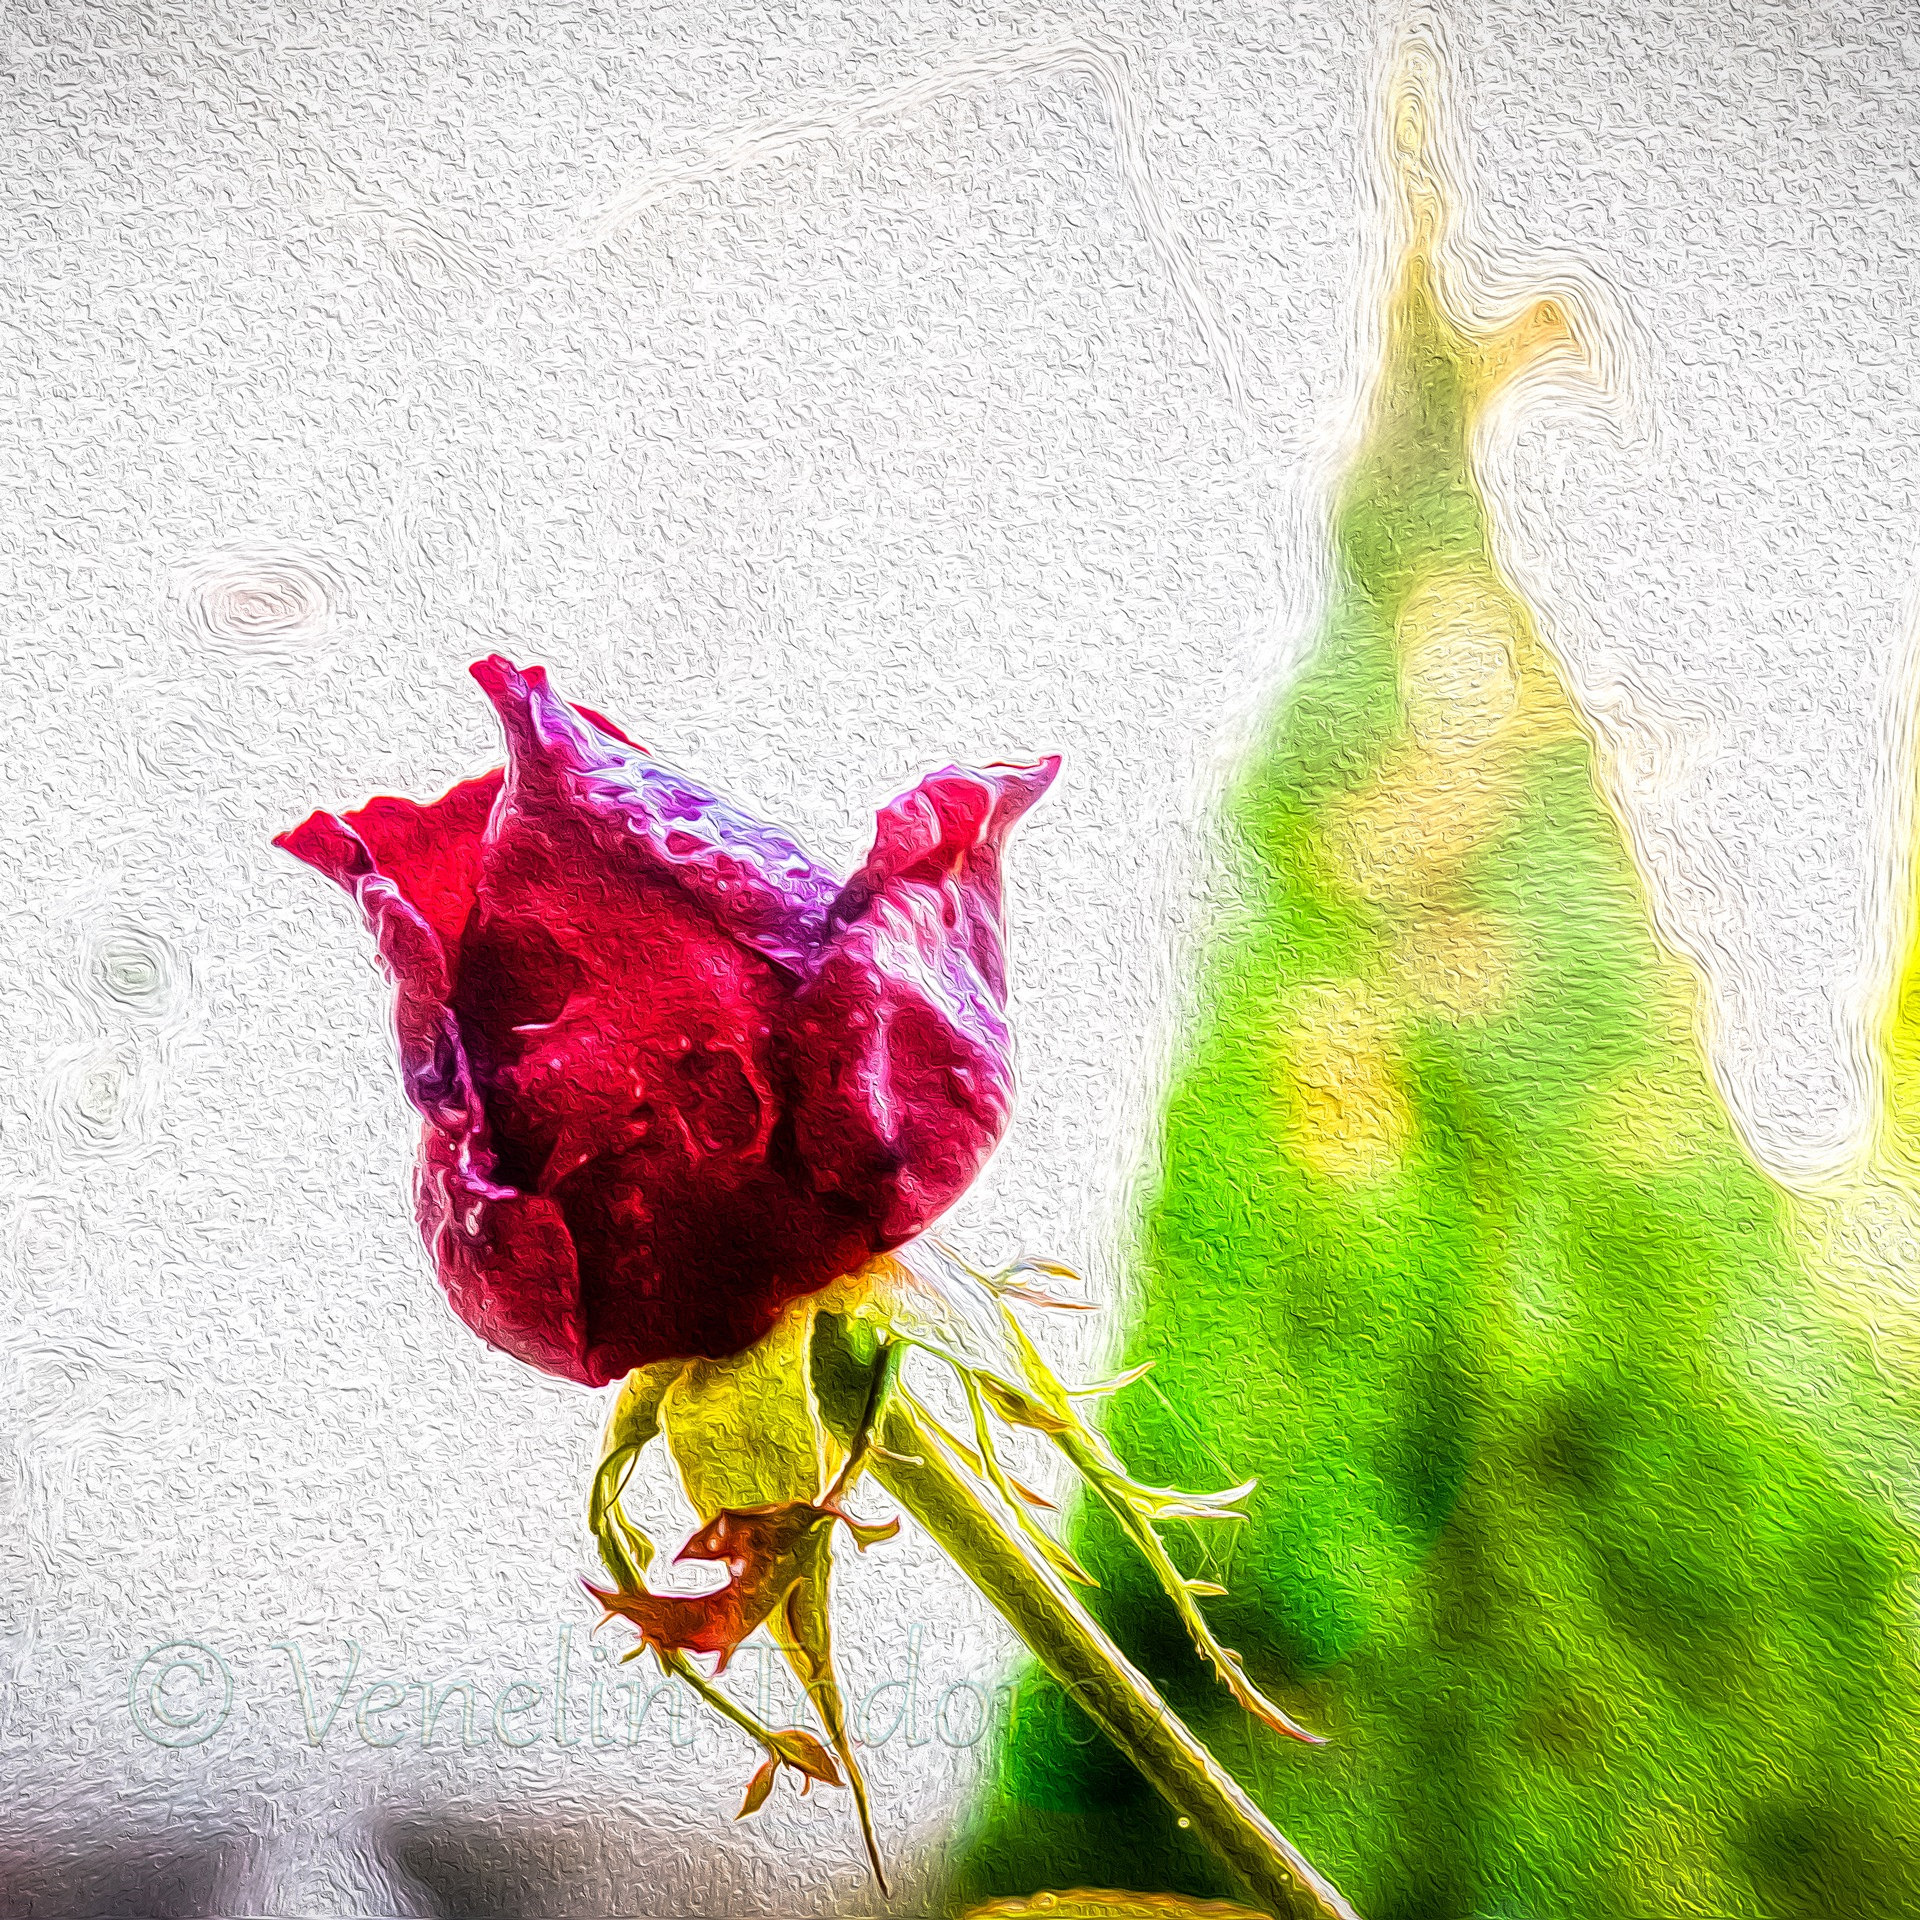 Rose- Paint oil by Venelin Todorov